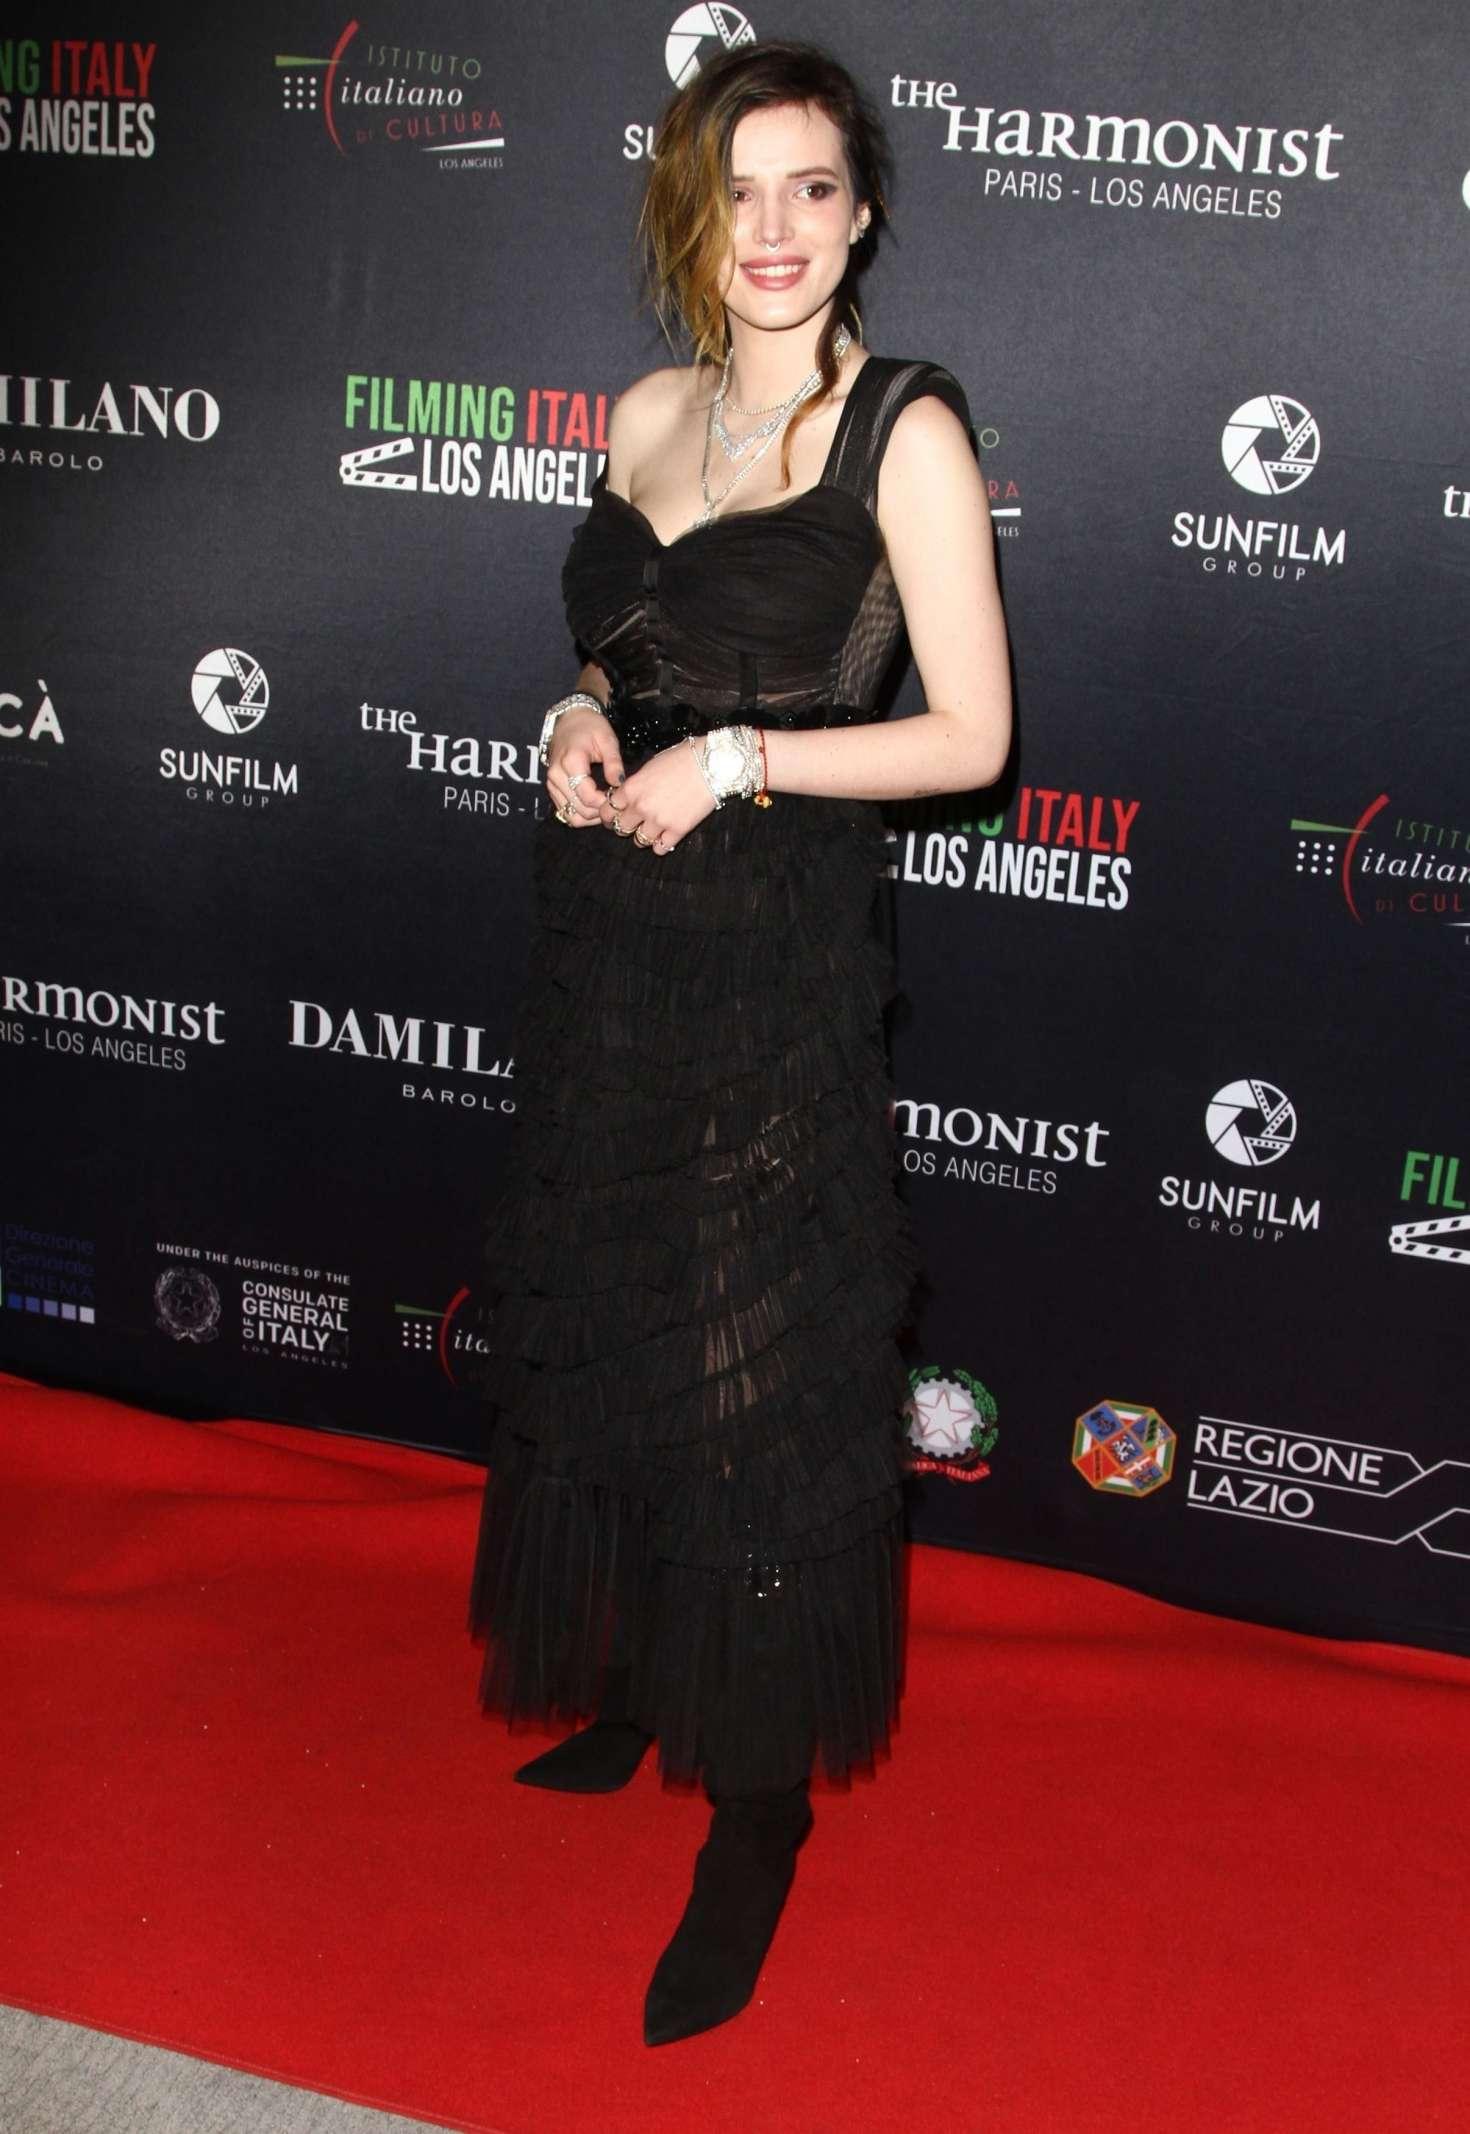 Bella Thorne 2019 : Bella Thorne: Filming Italy Awards -08